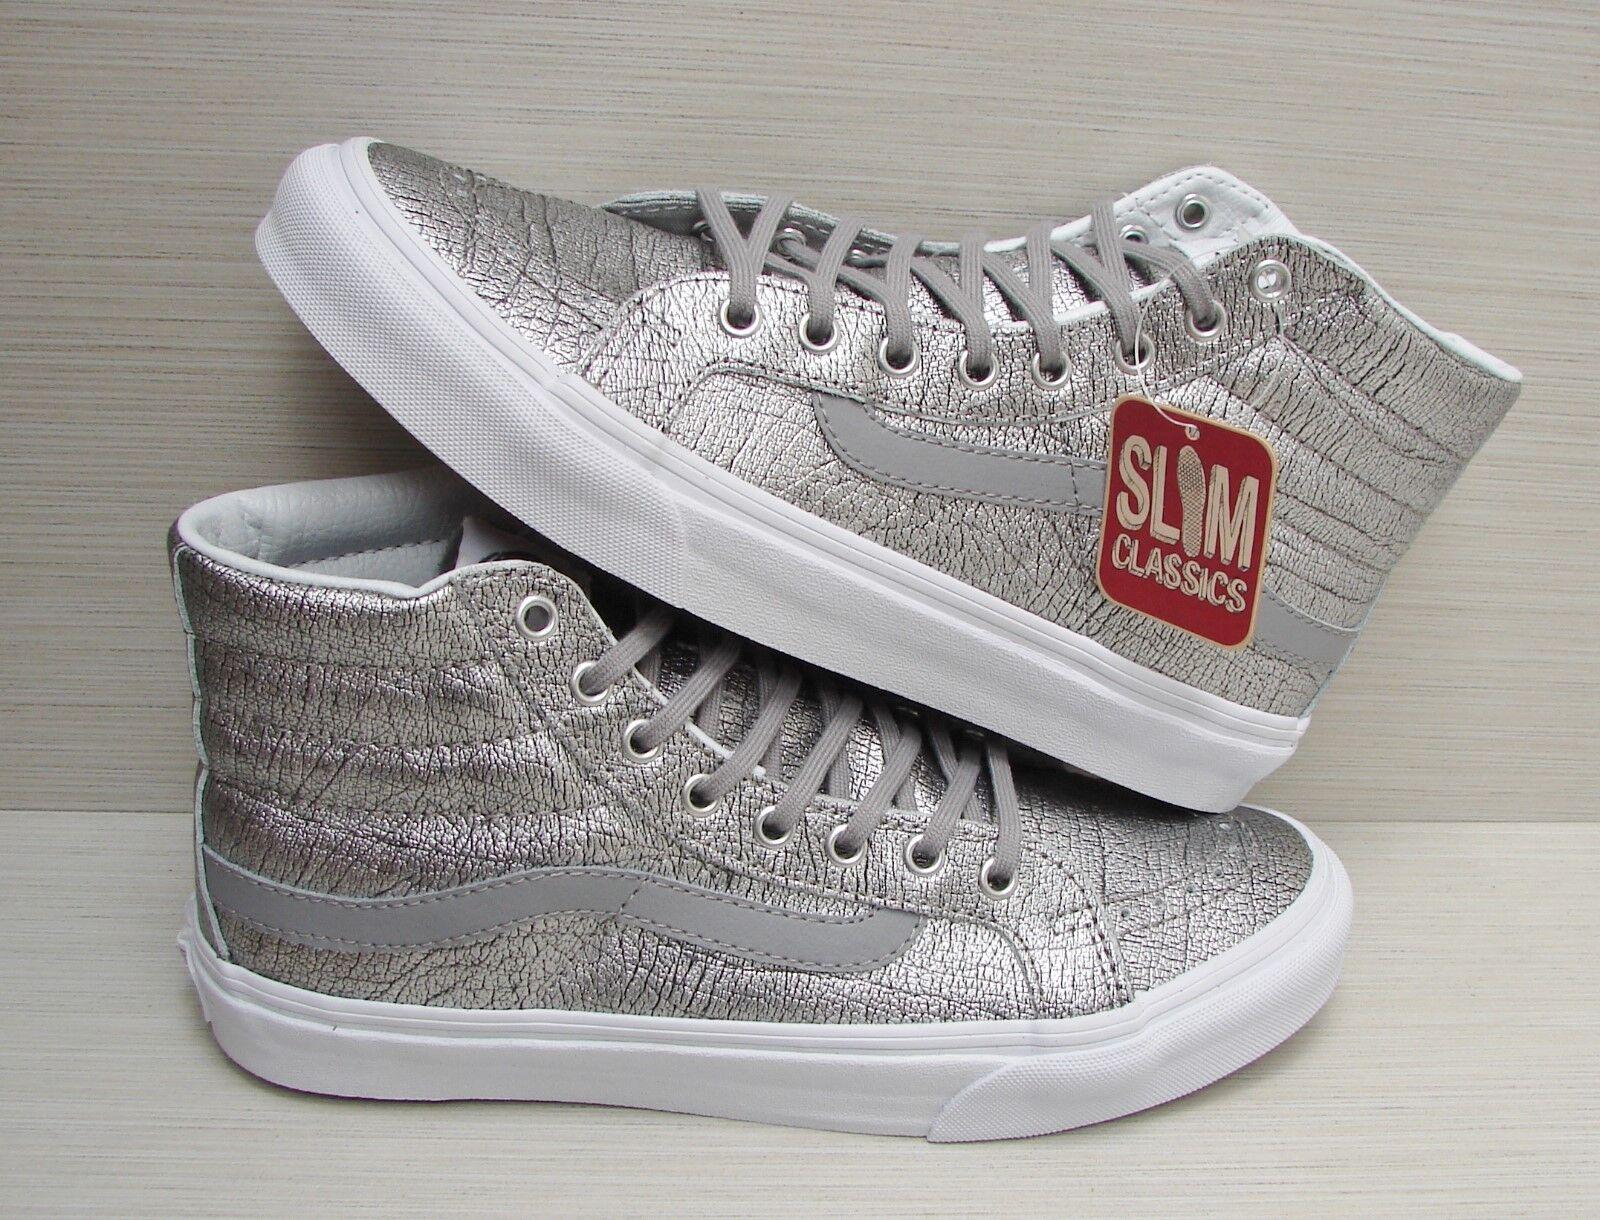 Vans SK8 Hi Slim Foil Metallic Silver True White VN00018IHTI Women's Size 9.5